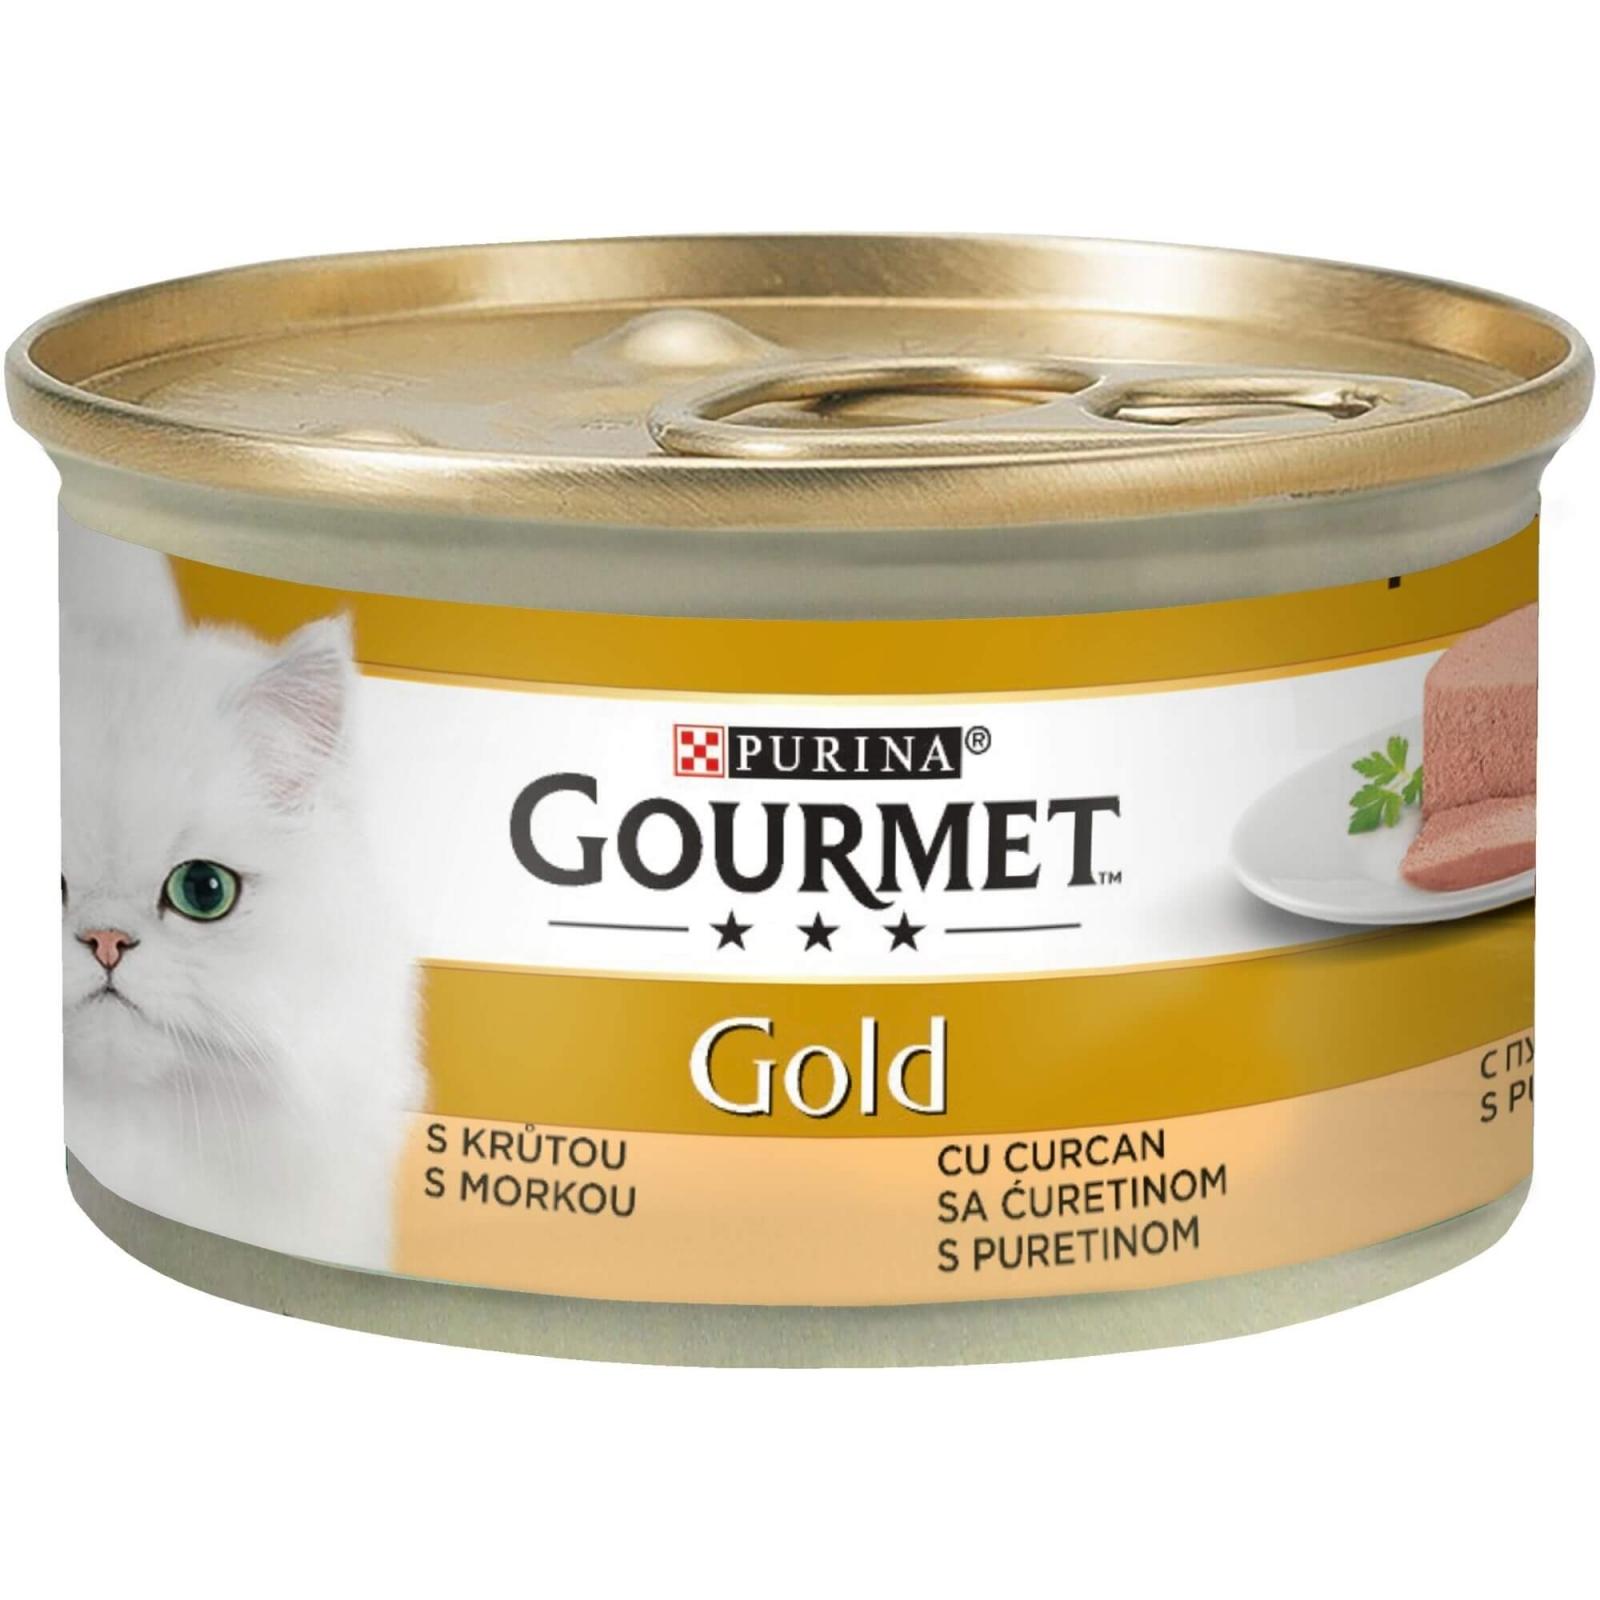 Gourmet Gold Mousse cu Curcan, 85 g imagine